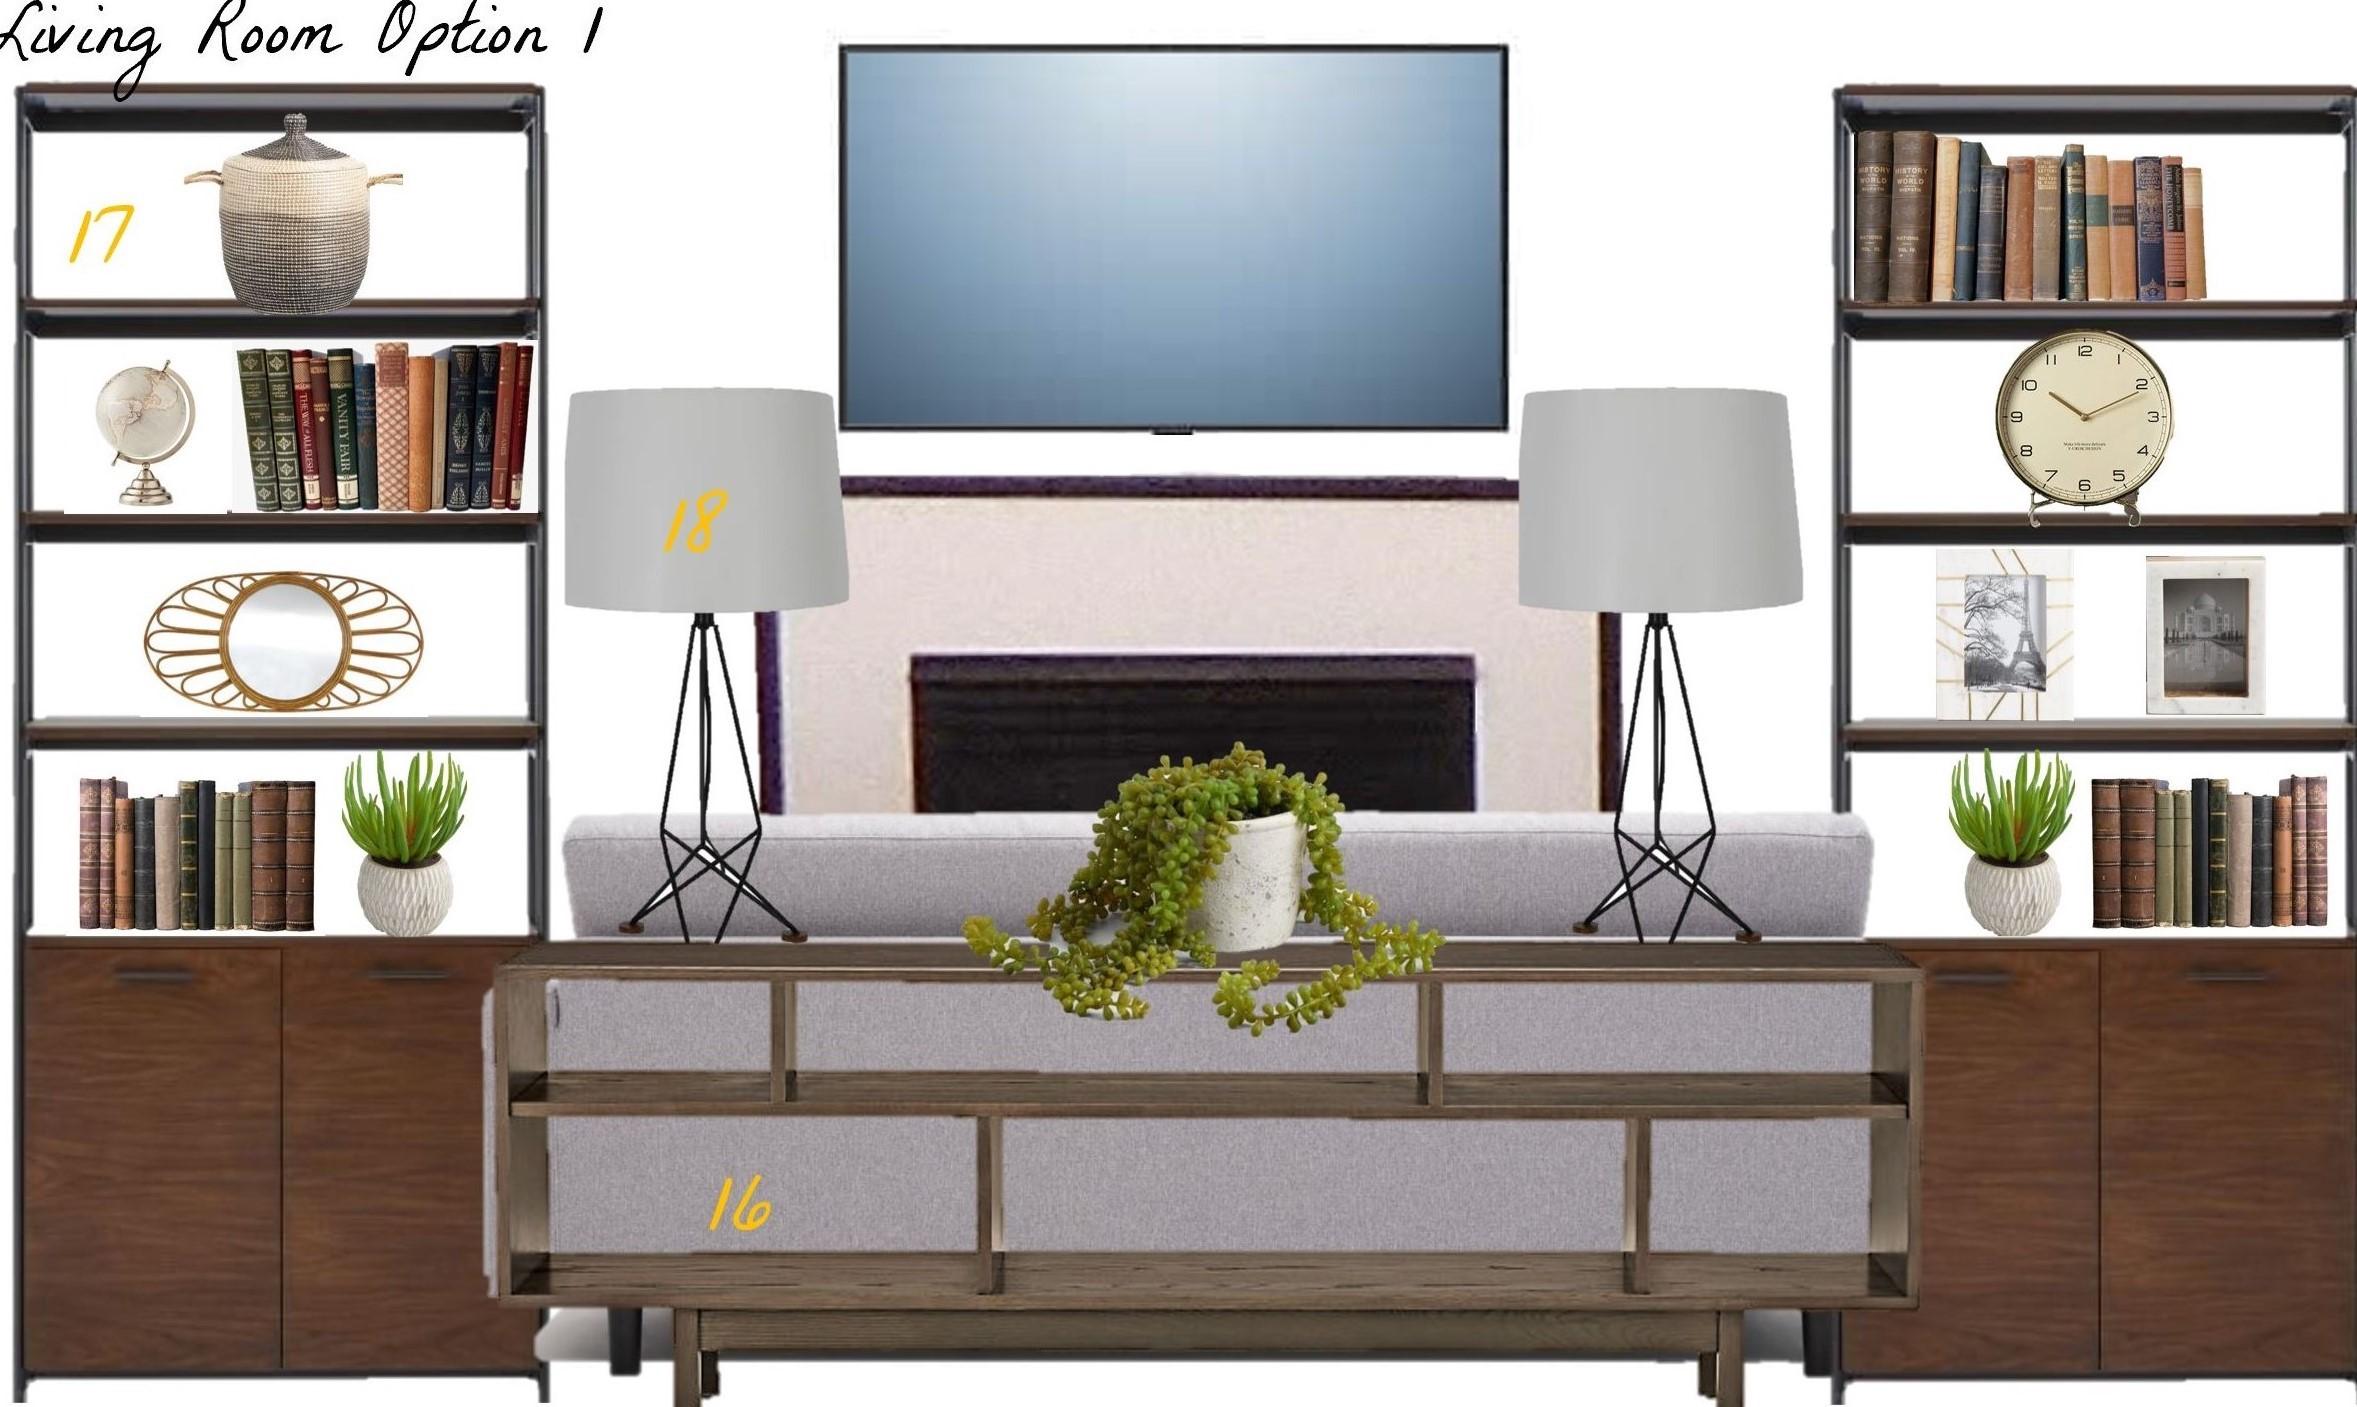 Modern Living Room Etagere Bookshelf Storage Ideas